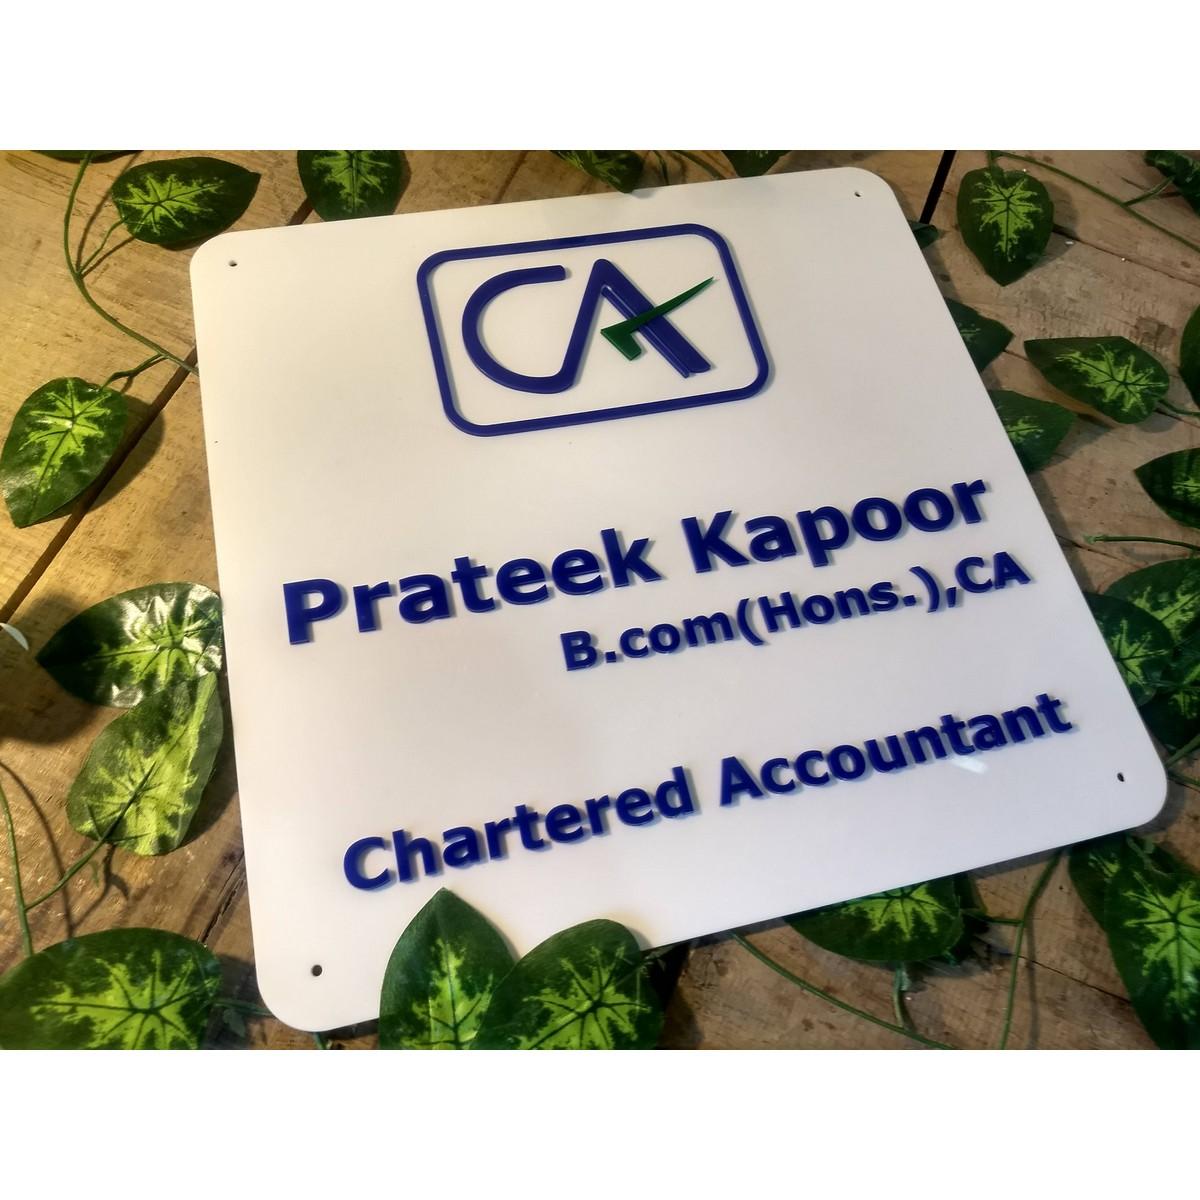 Chartered Accountant Weatherproof Name Plate  Chartered Accountant Weatherproof Name Plate 3